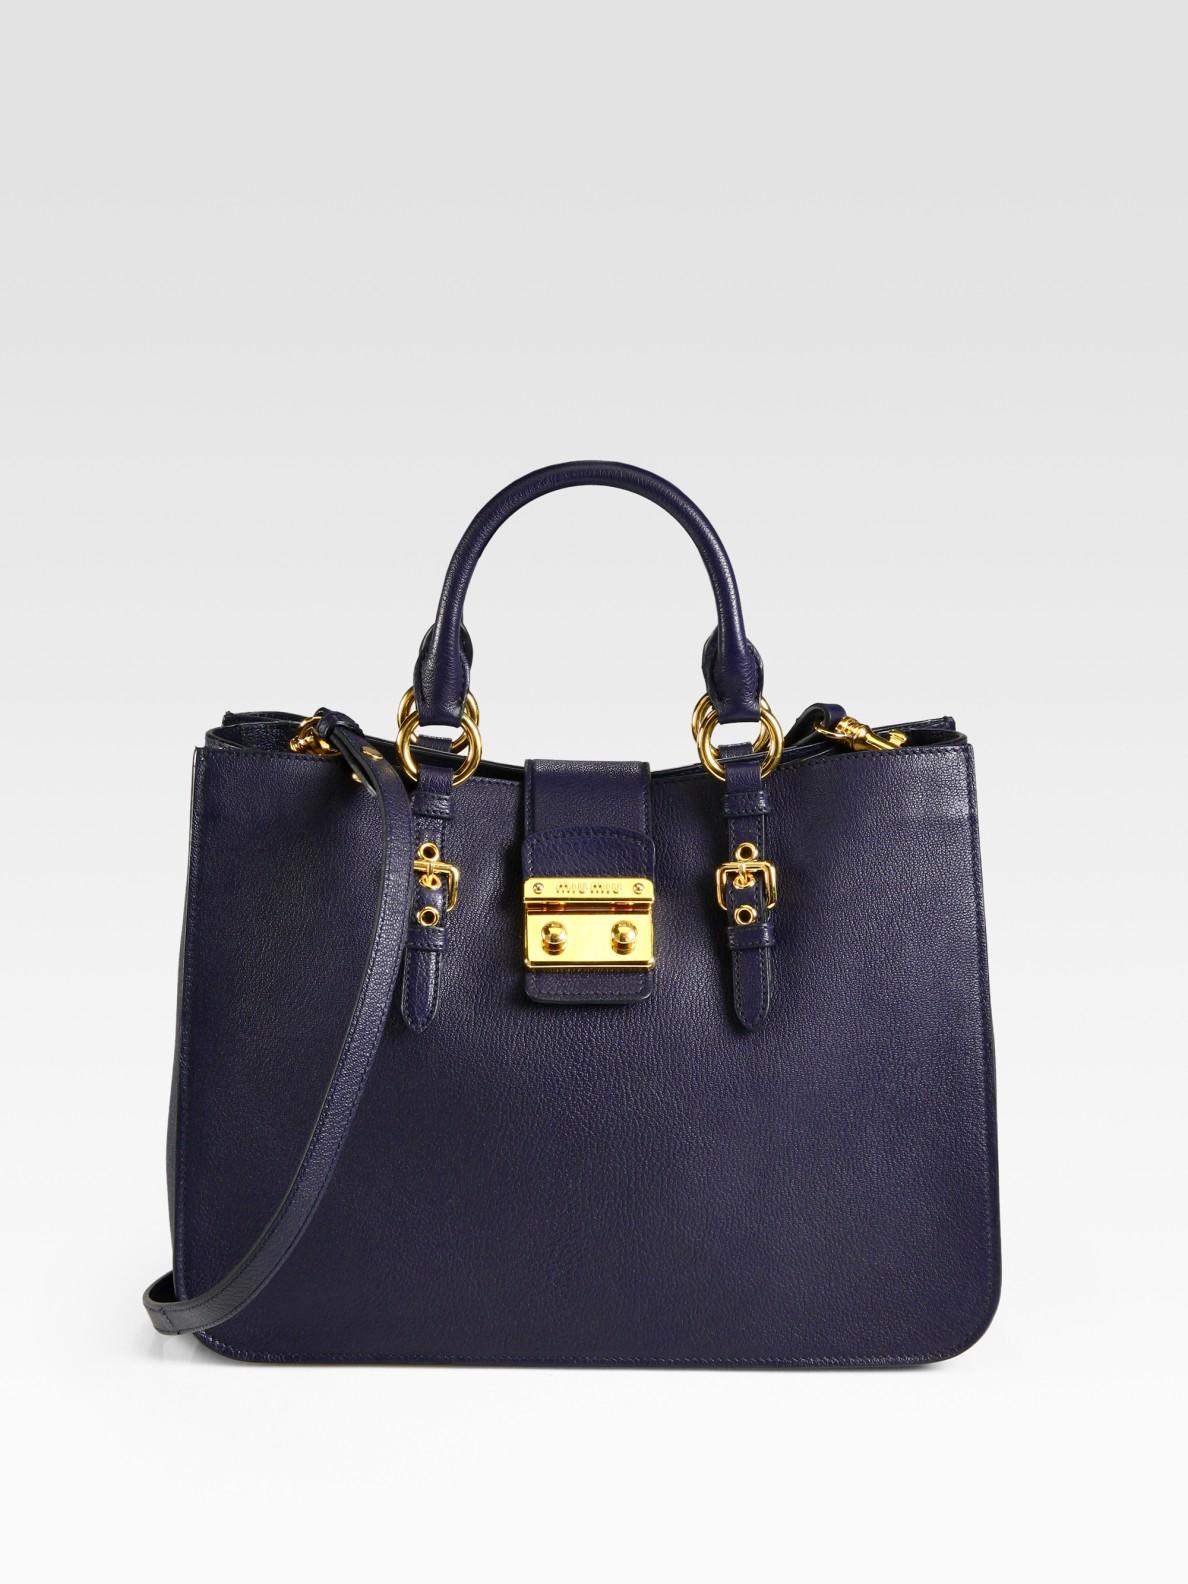 chloe marcie saddle bag - miu miu madras satchel, wholesale miu miu bags